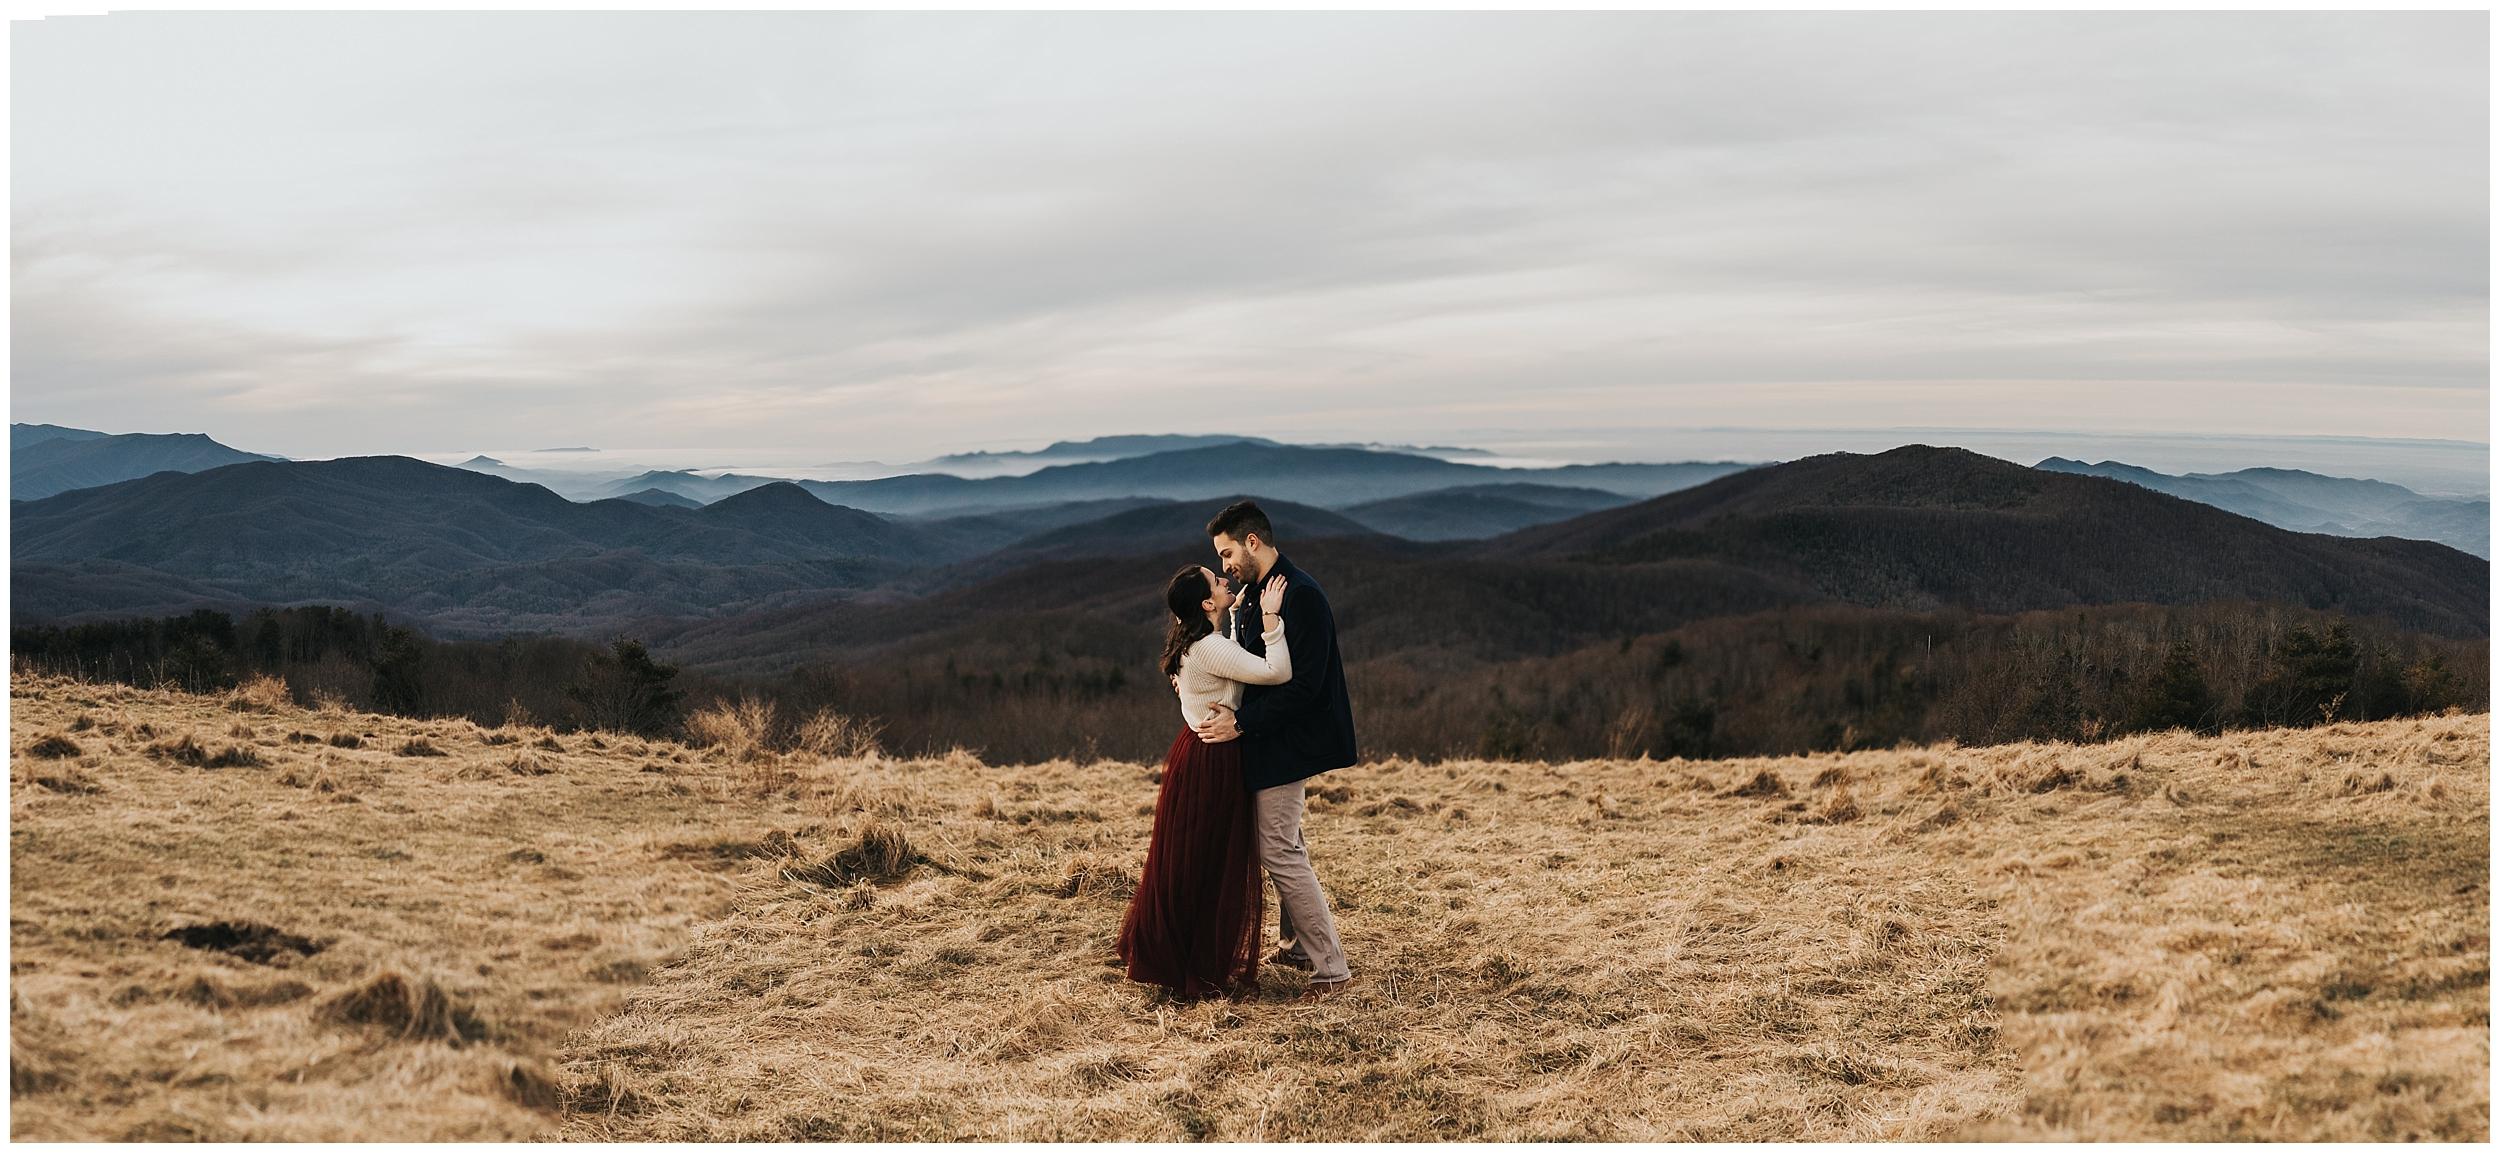 lovestoriesco-asheville-wedding-photographers-engagement-max-patch-mountain_0031.jpg